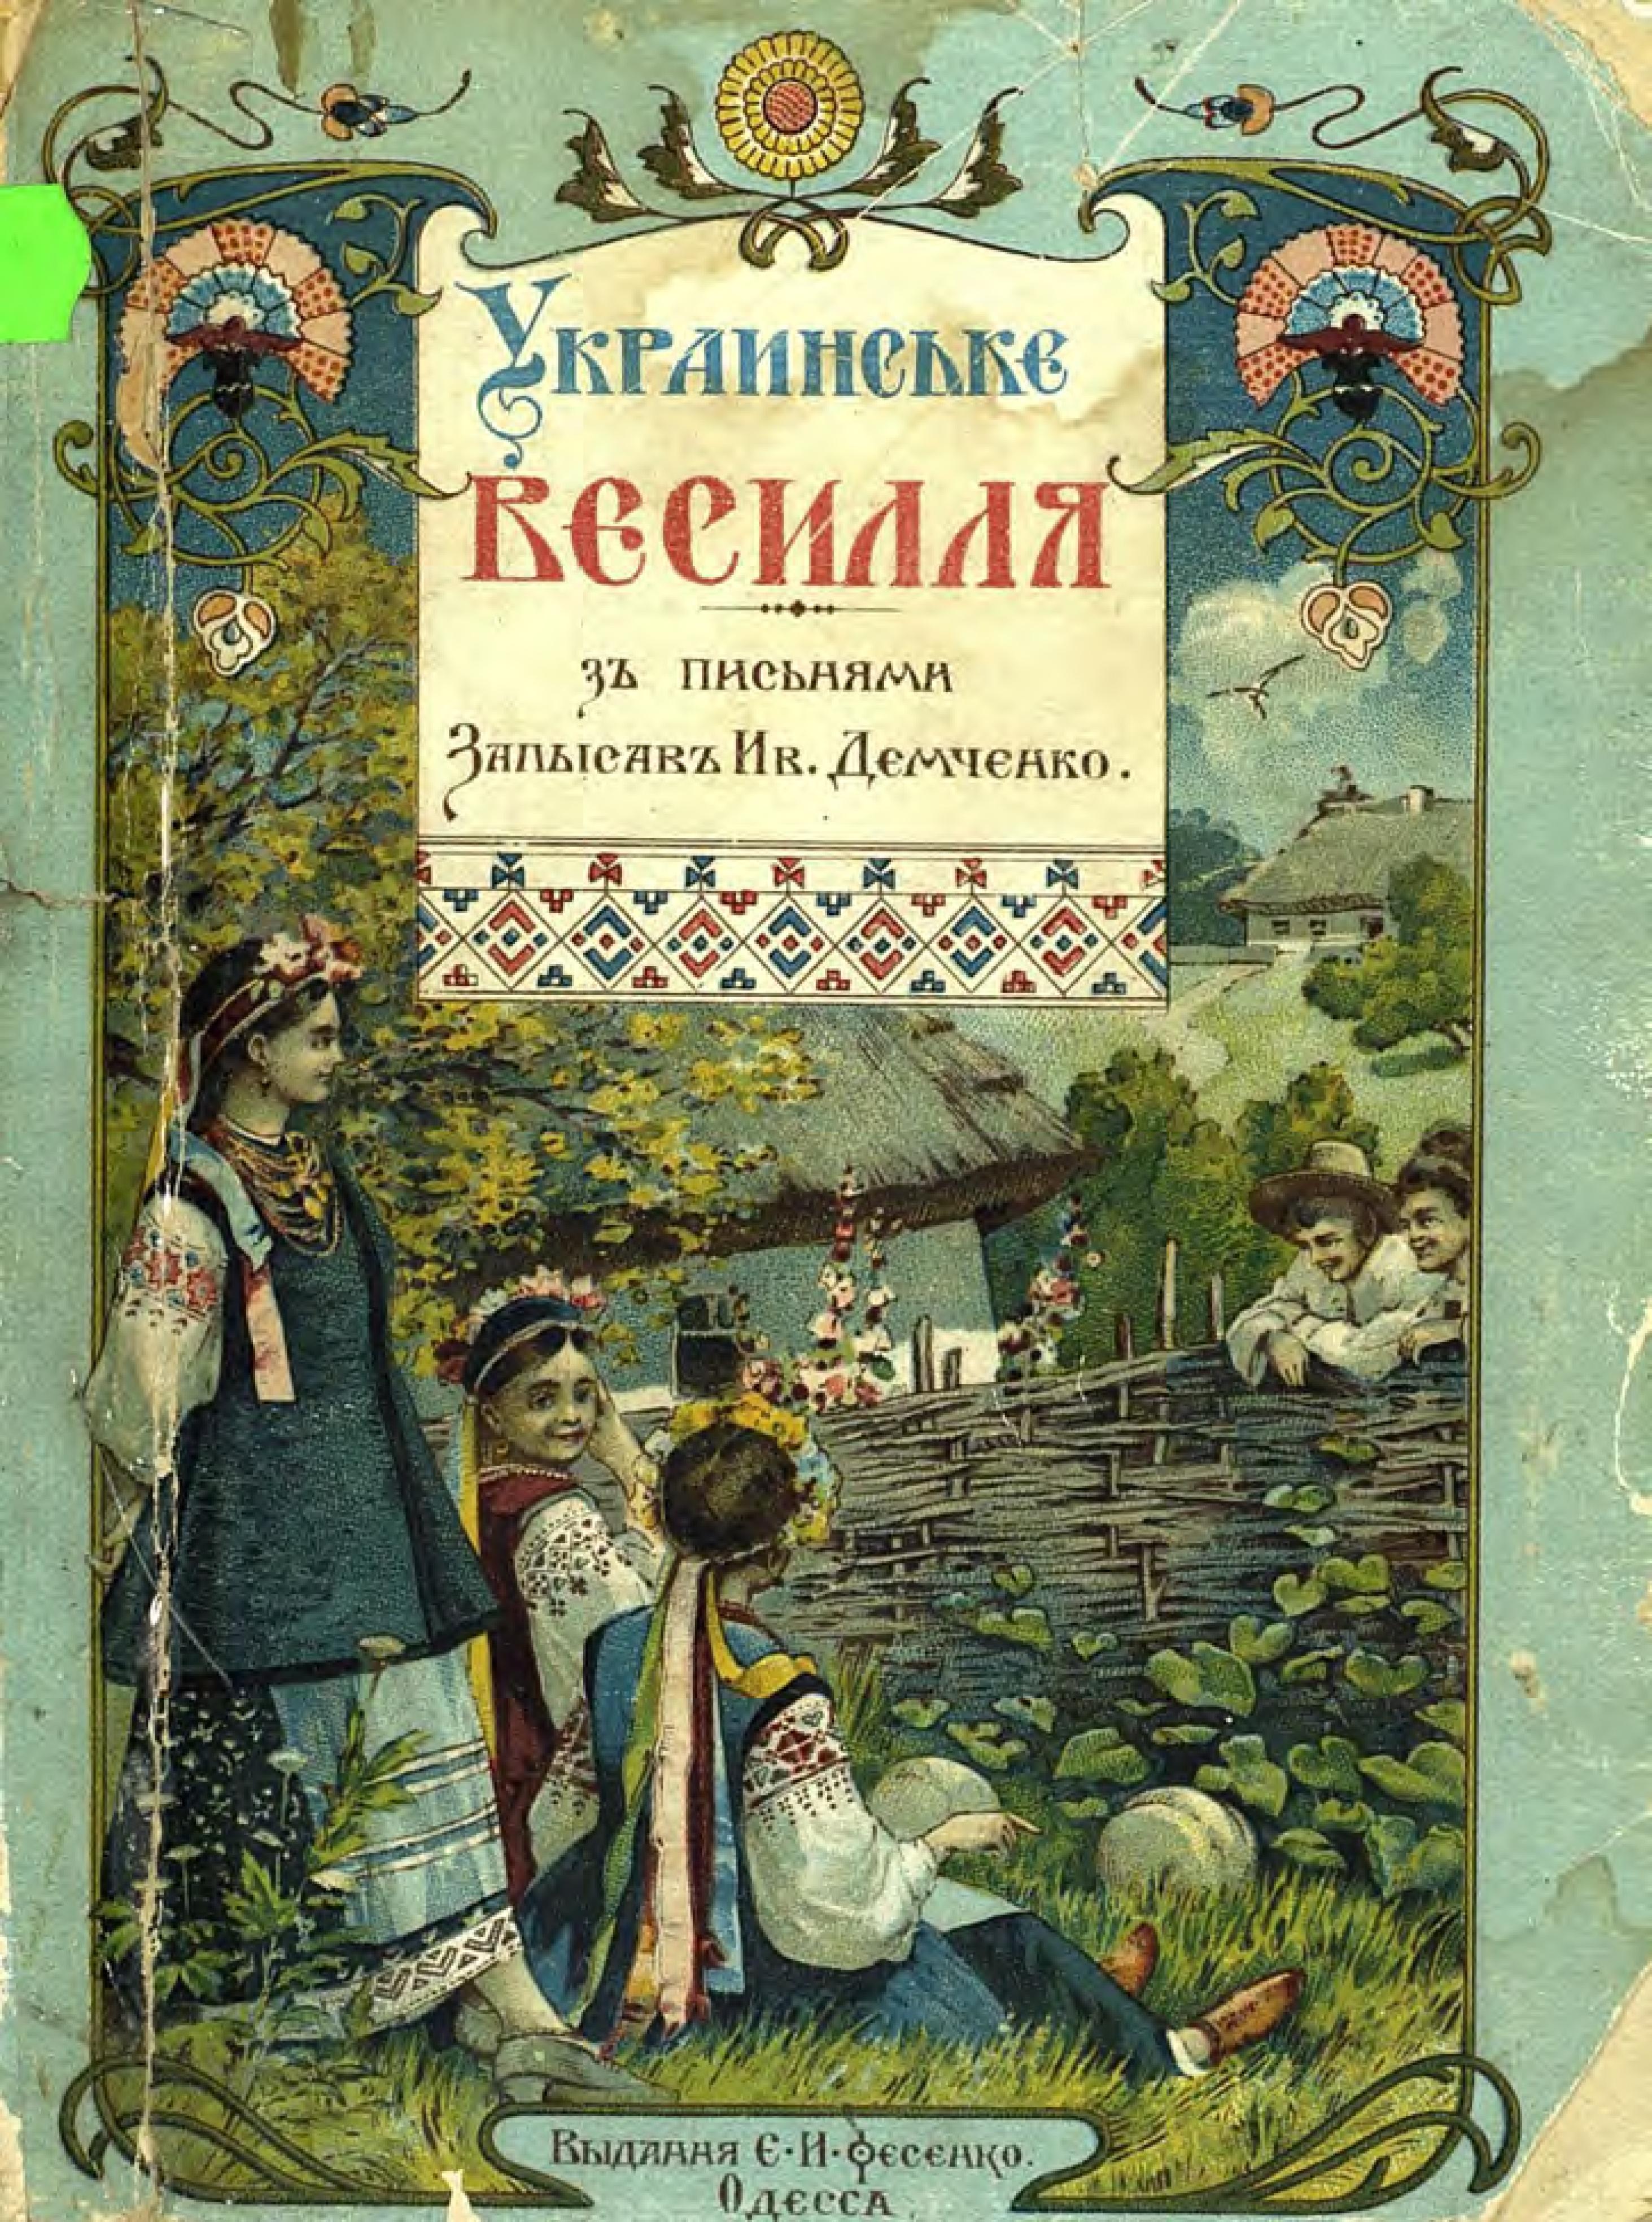 цена на Народное творчество Украинське весилля